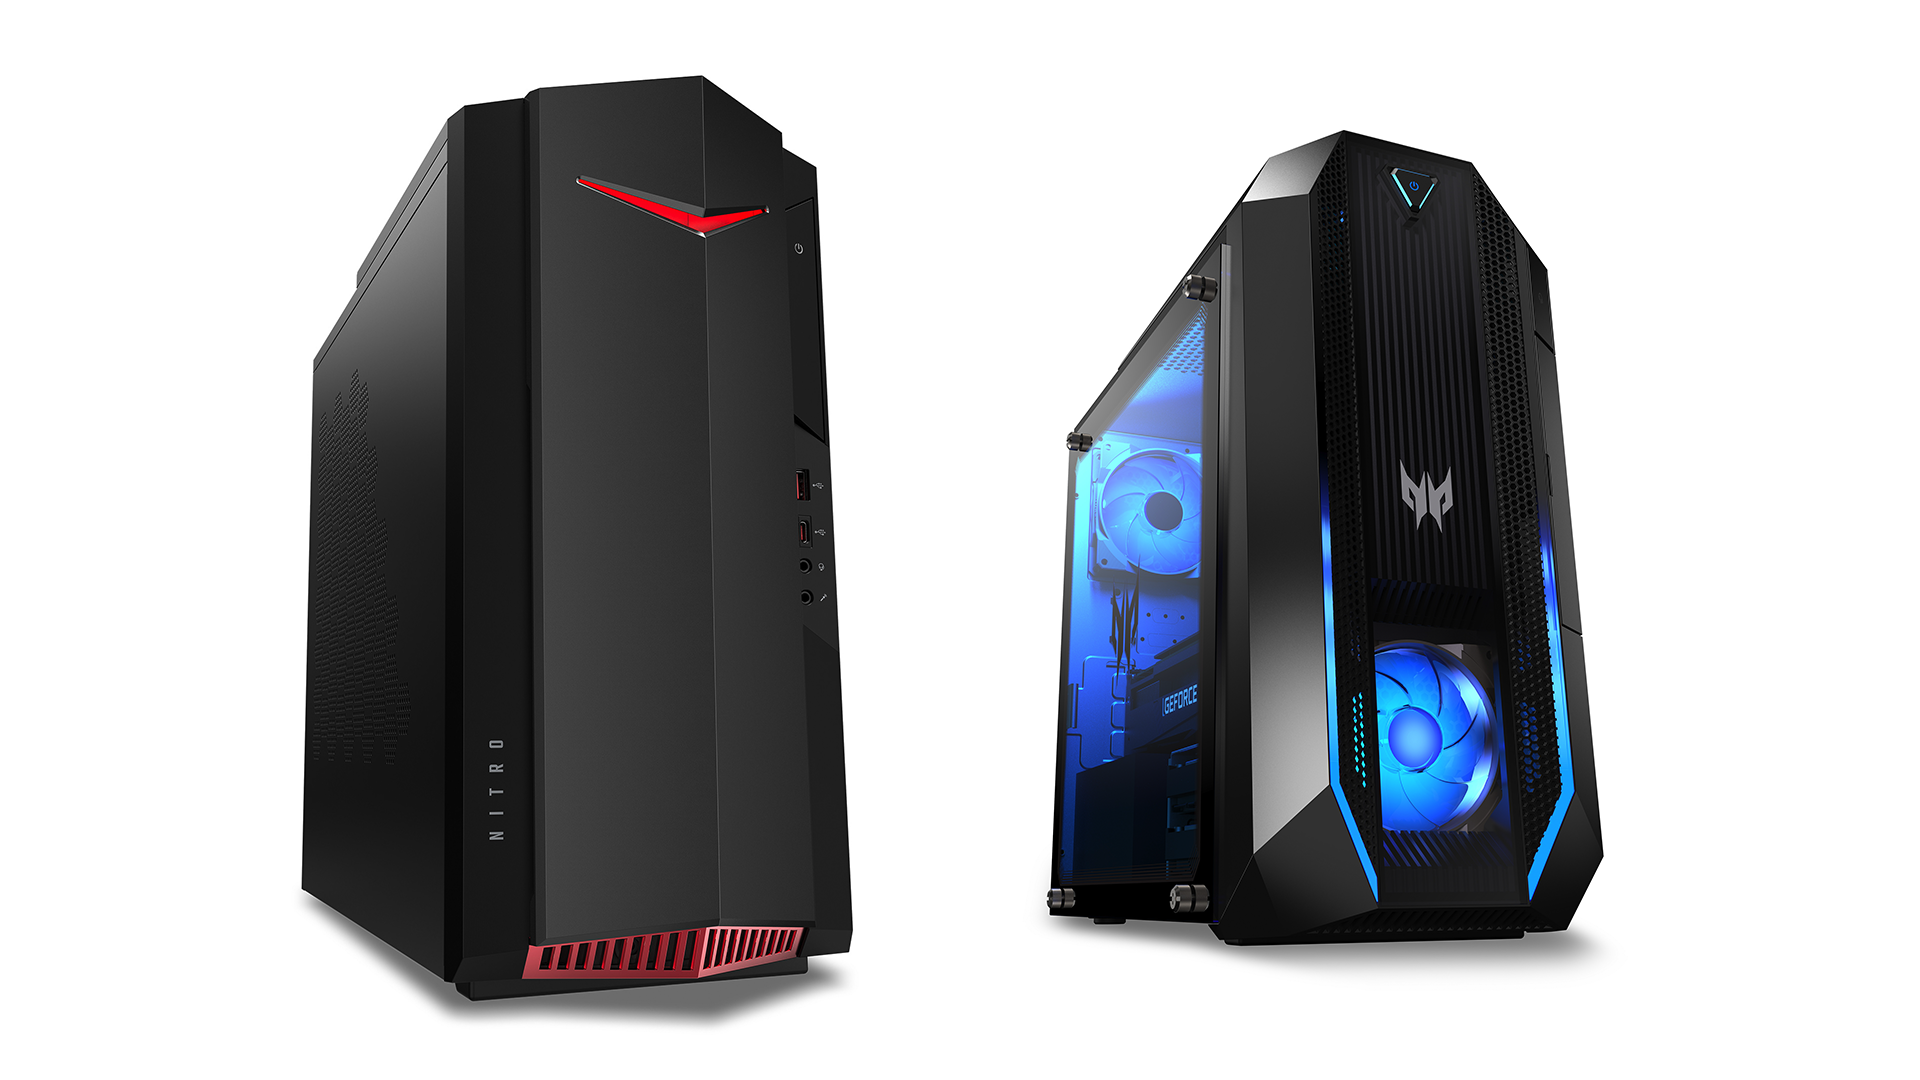 The Predator Orion 3000 and Nitro 50 Gaming Desktops